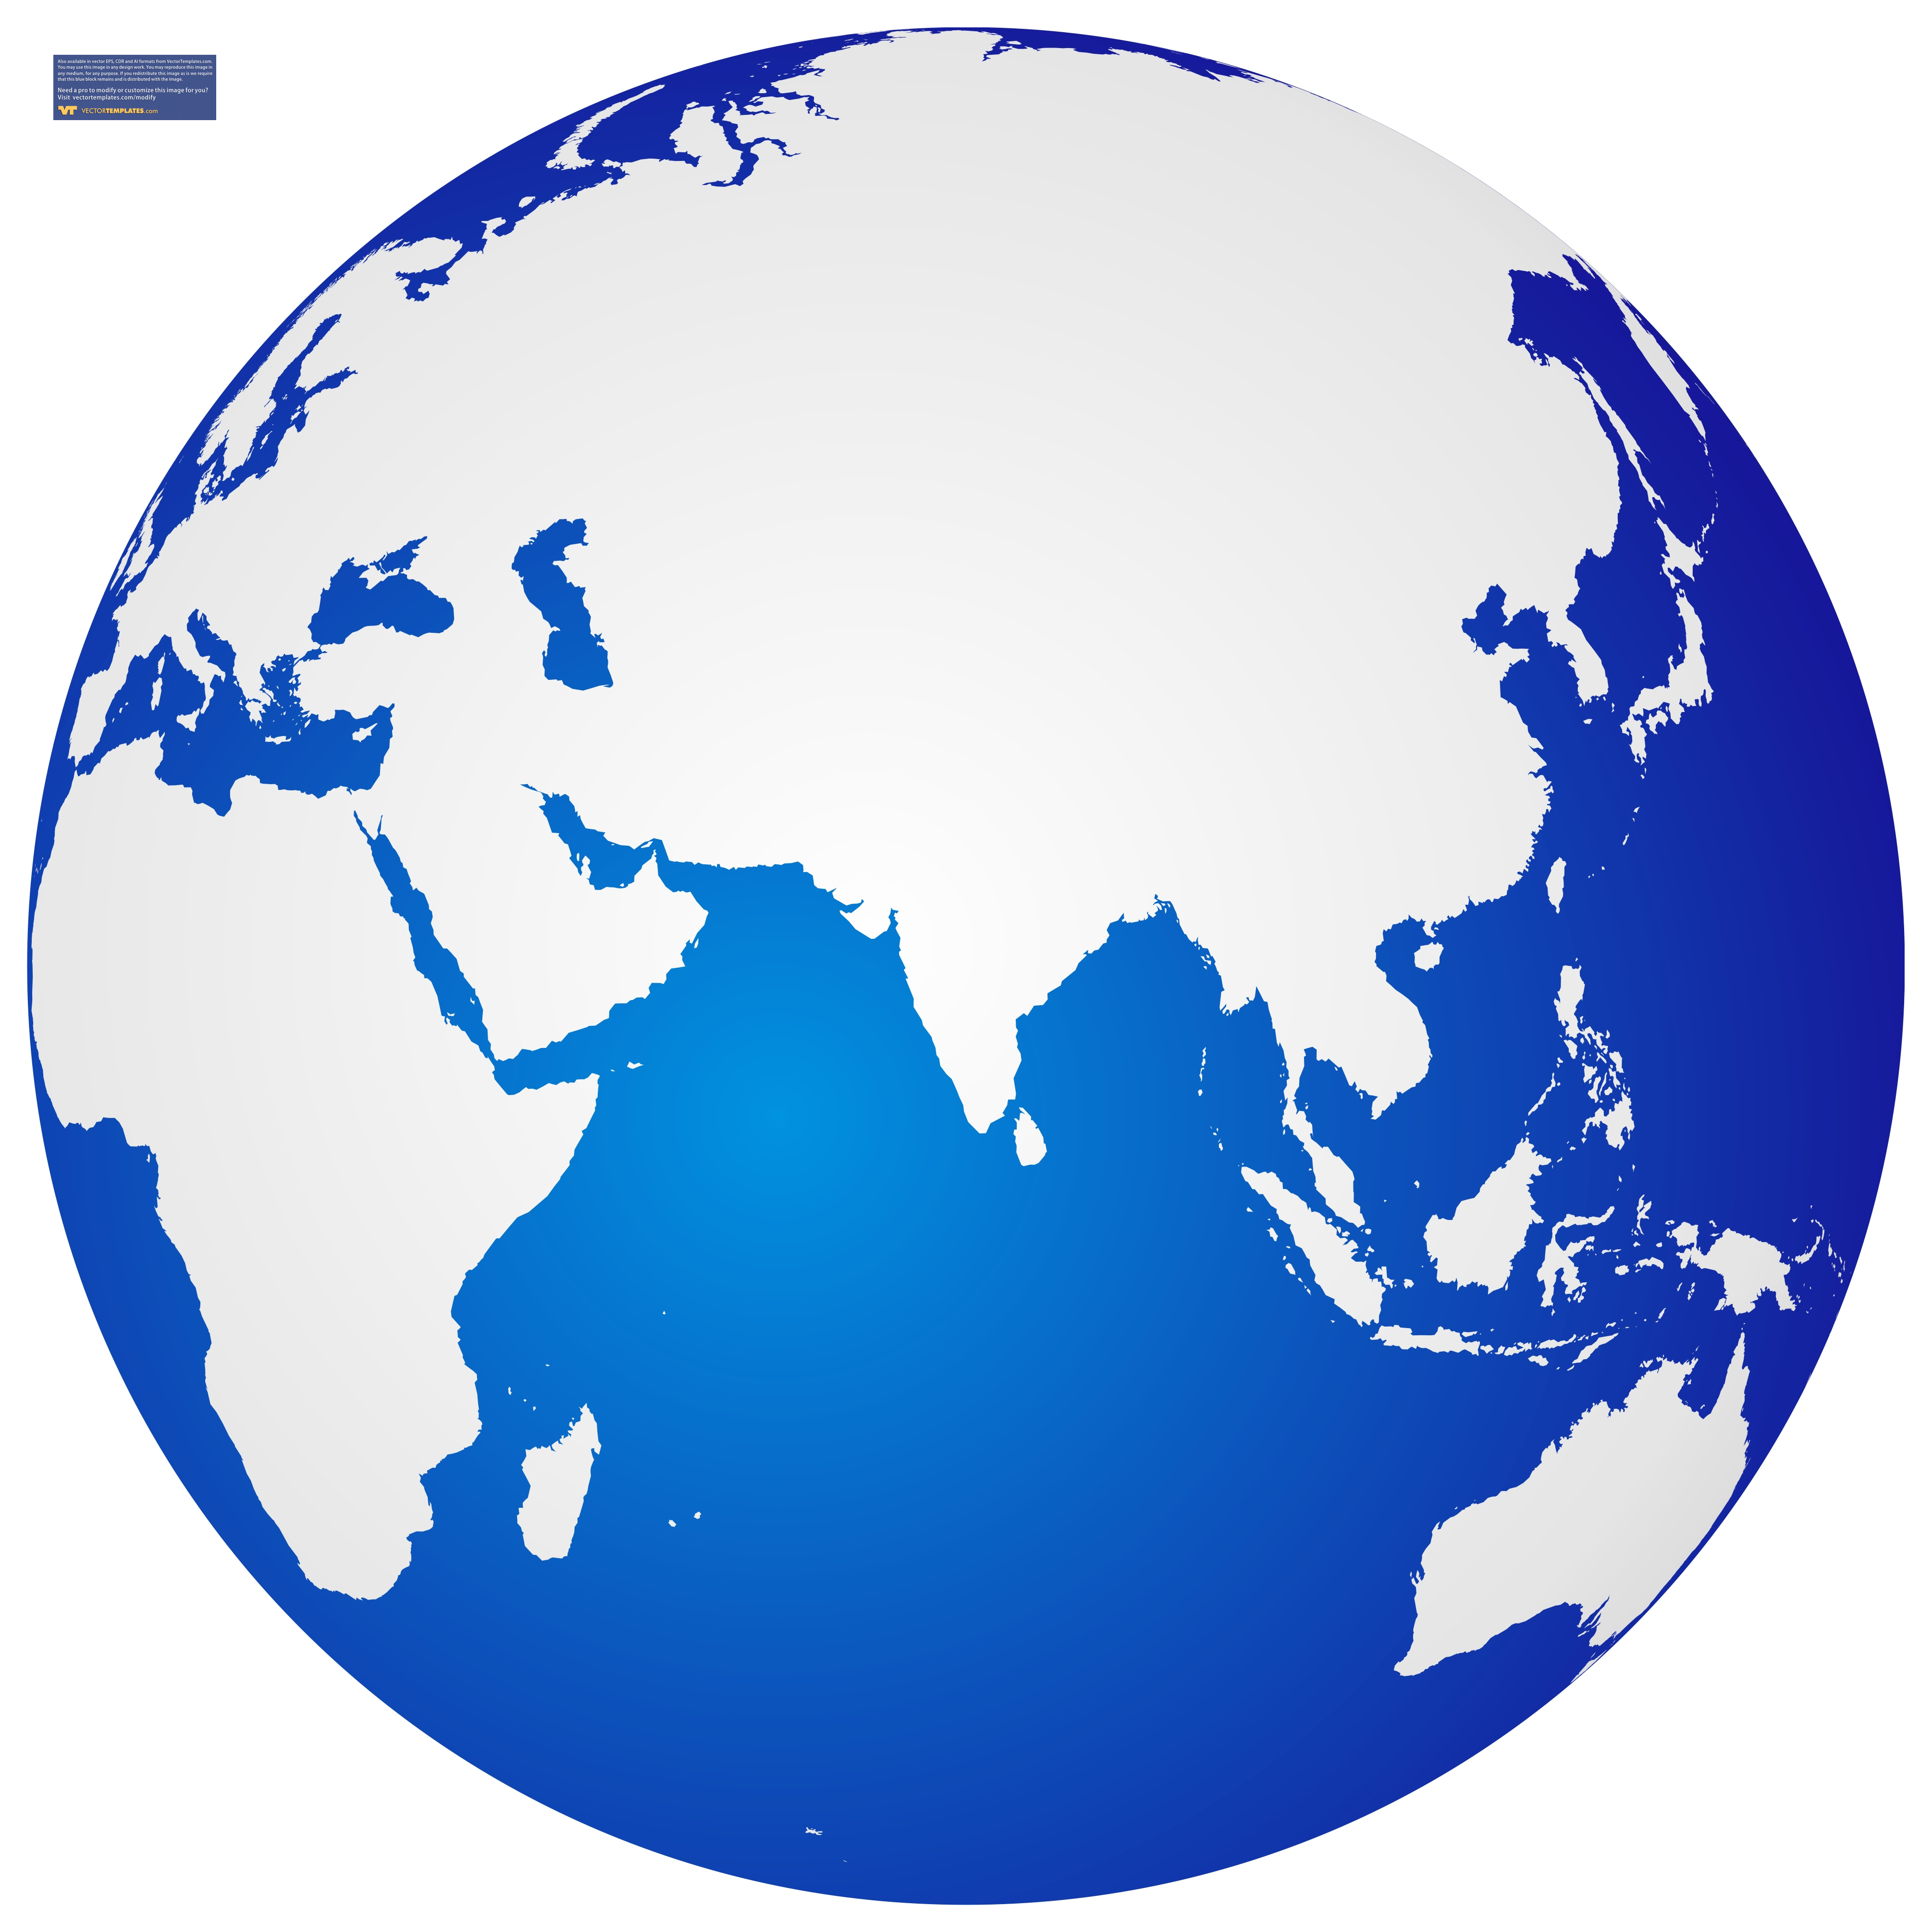 Clipart earth asia. Cartoon clip art library